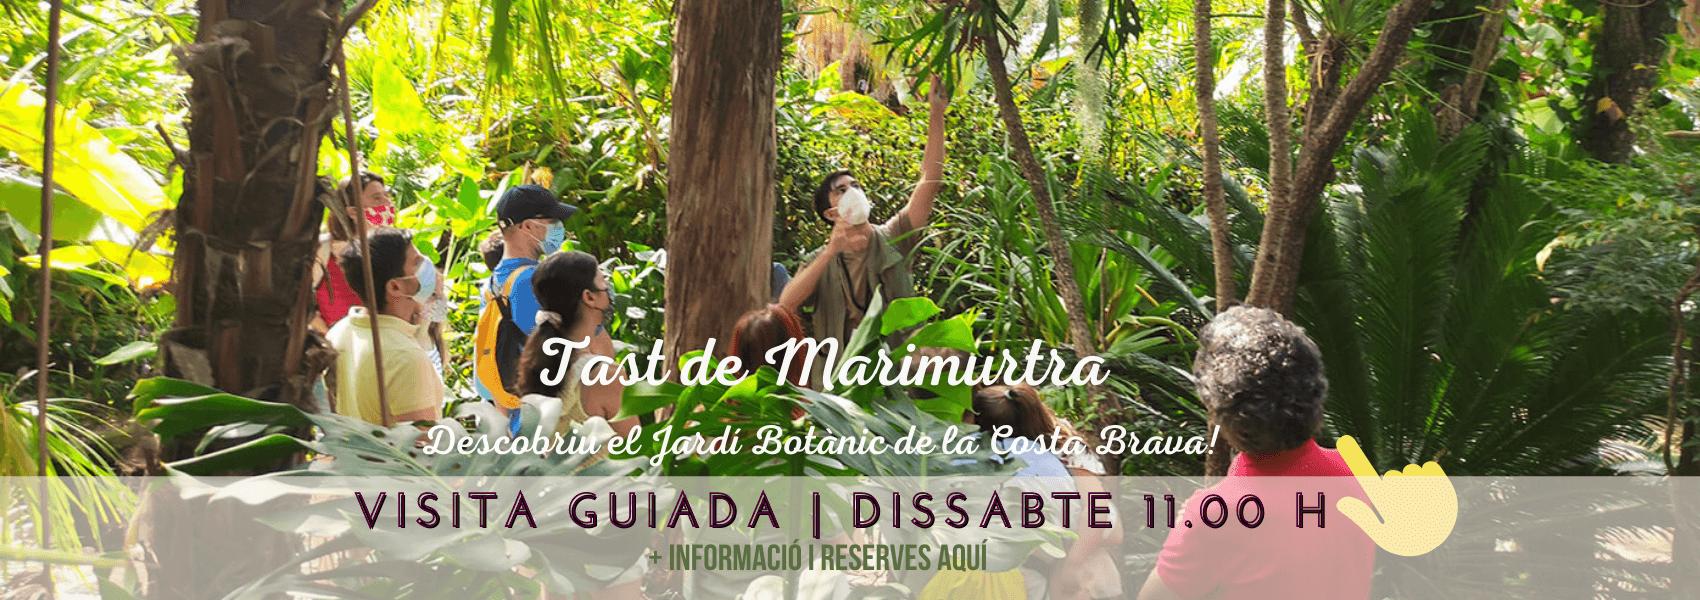 Visita Guiada Tast | Jardí Botànic Marimurtra